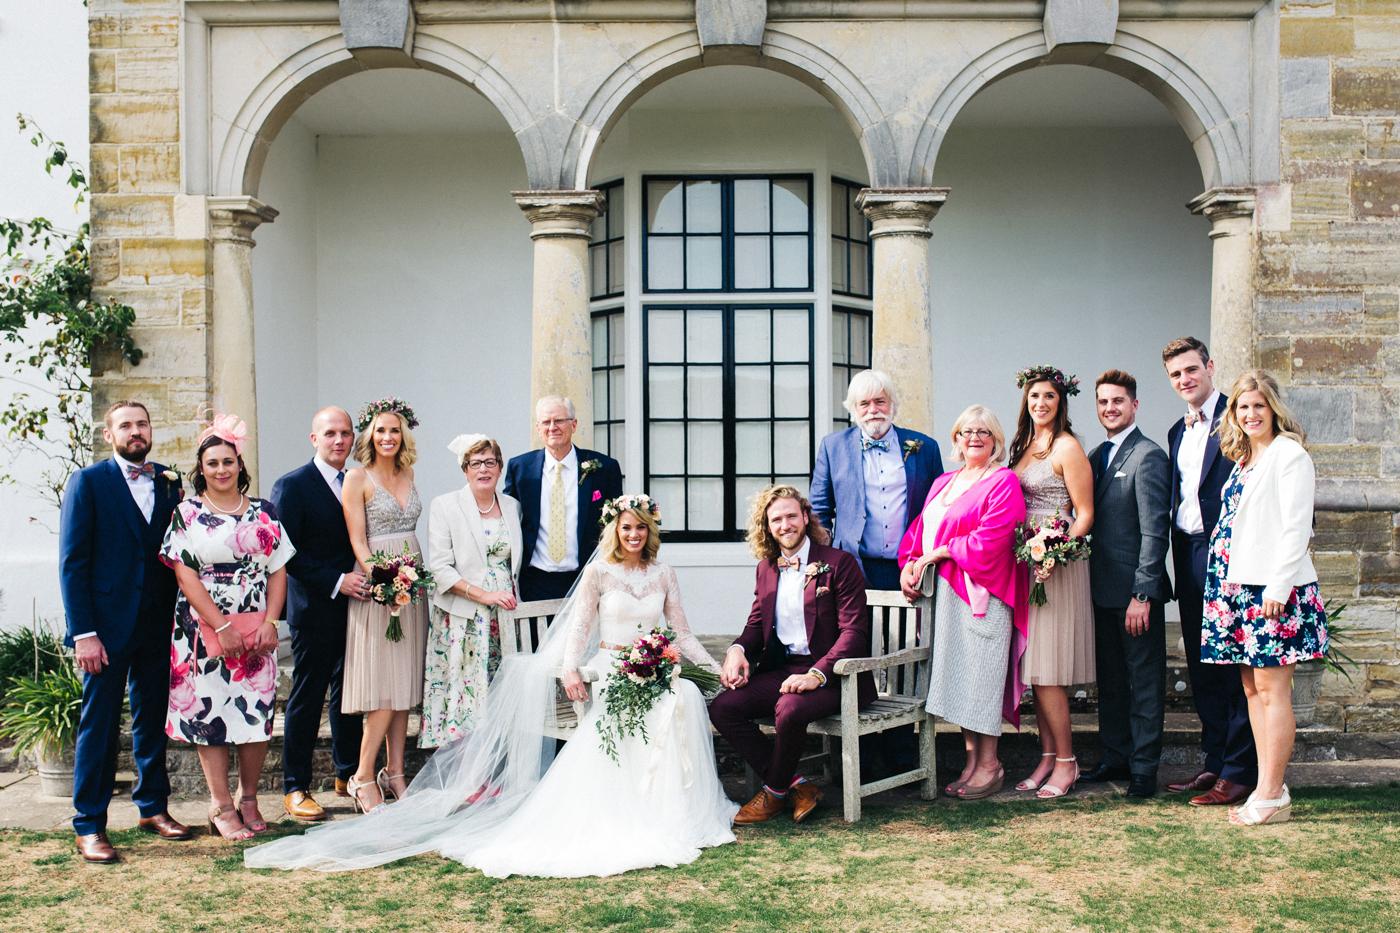 bentley-wildfowl-motor-museum-wedding-photographer-lewes-brighton-east-sussex-0018.jpg